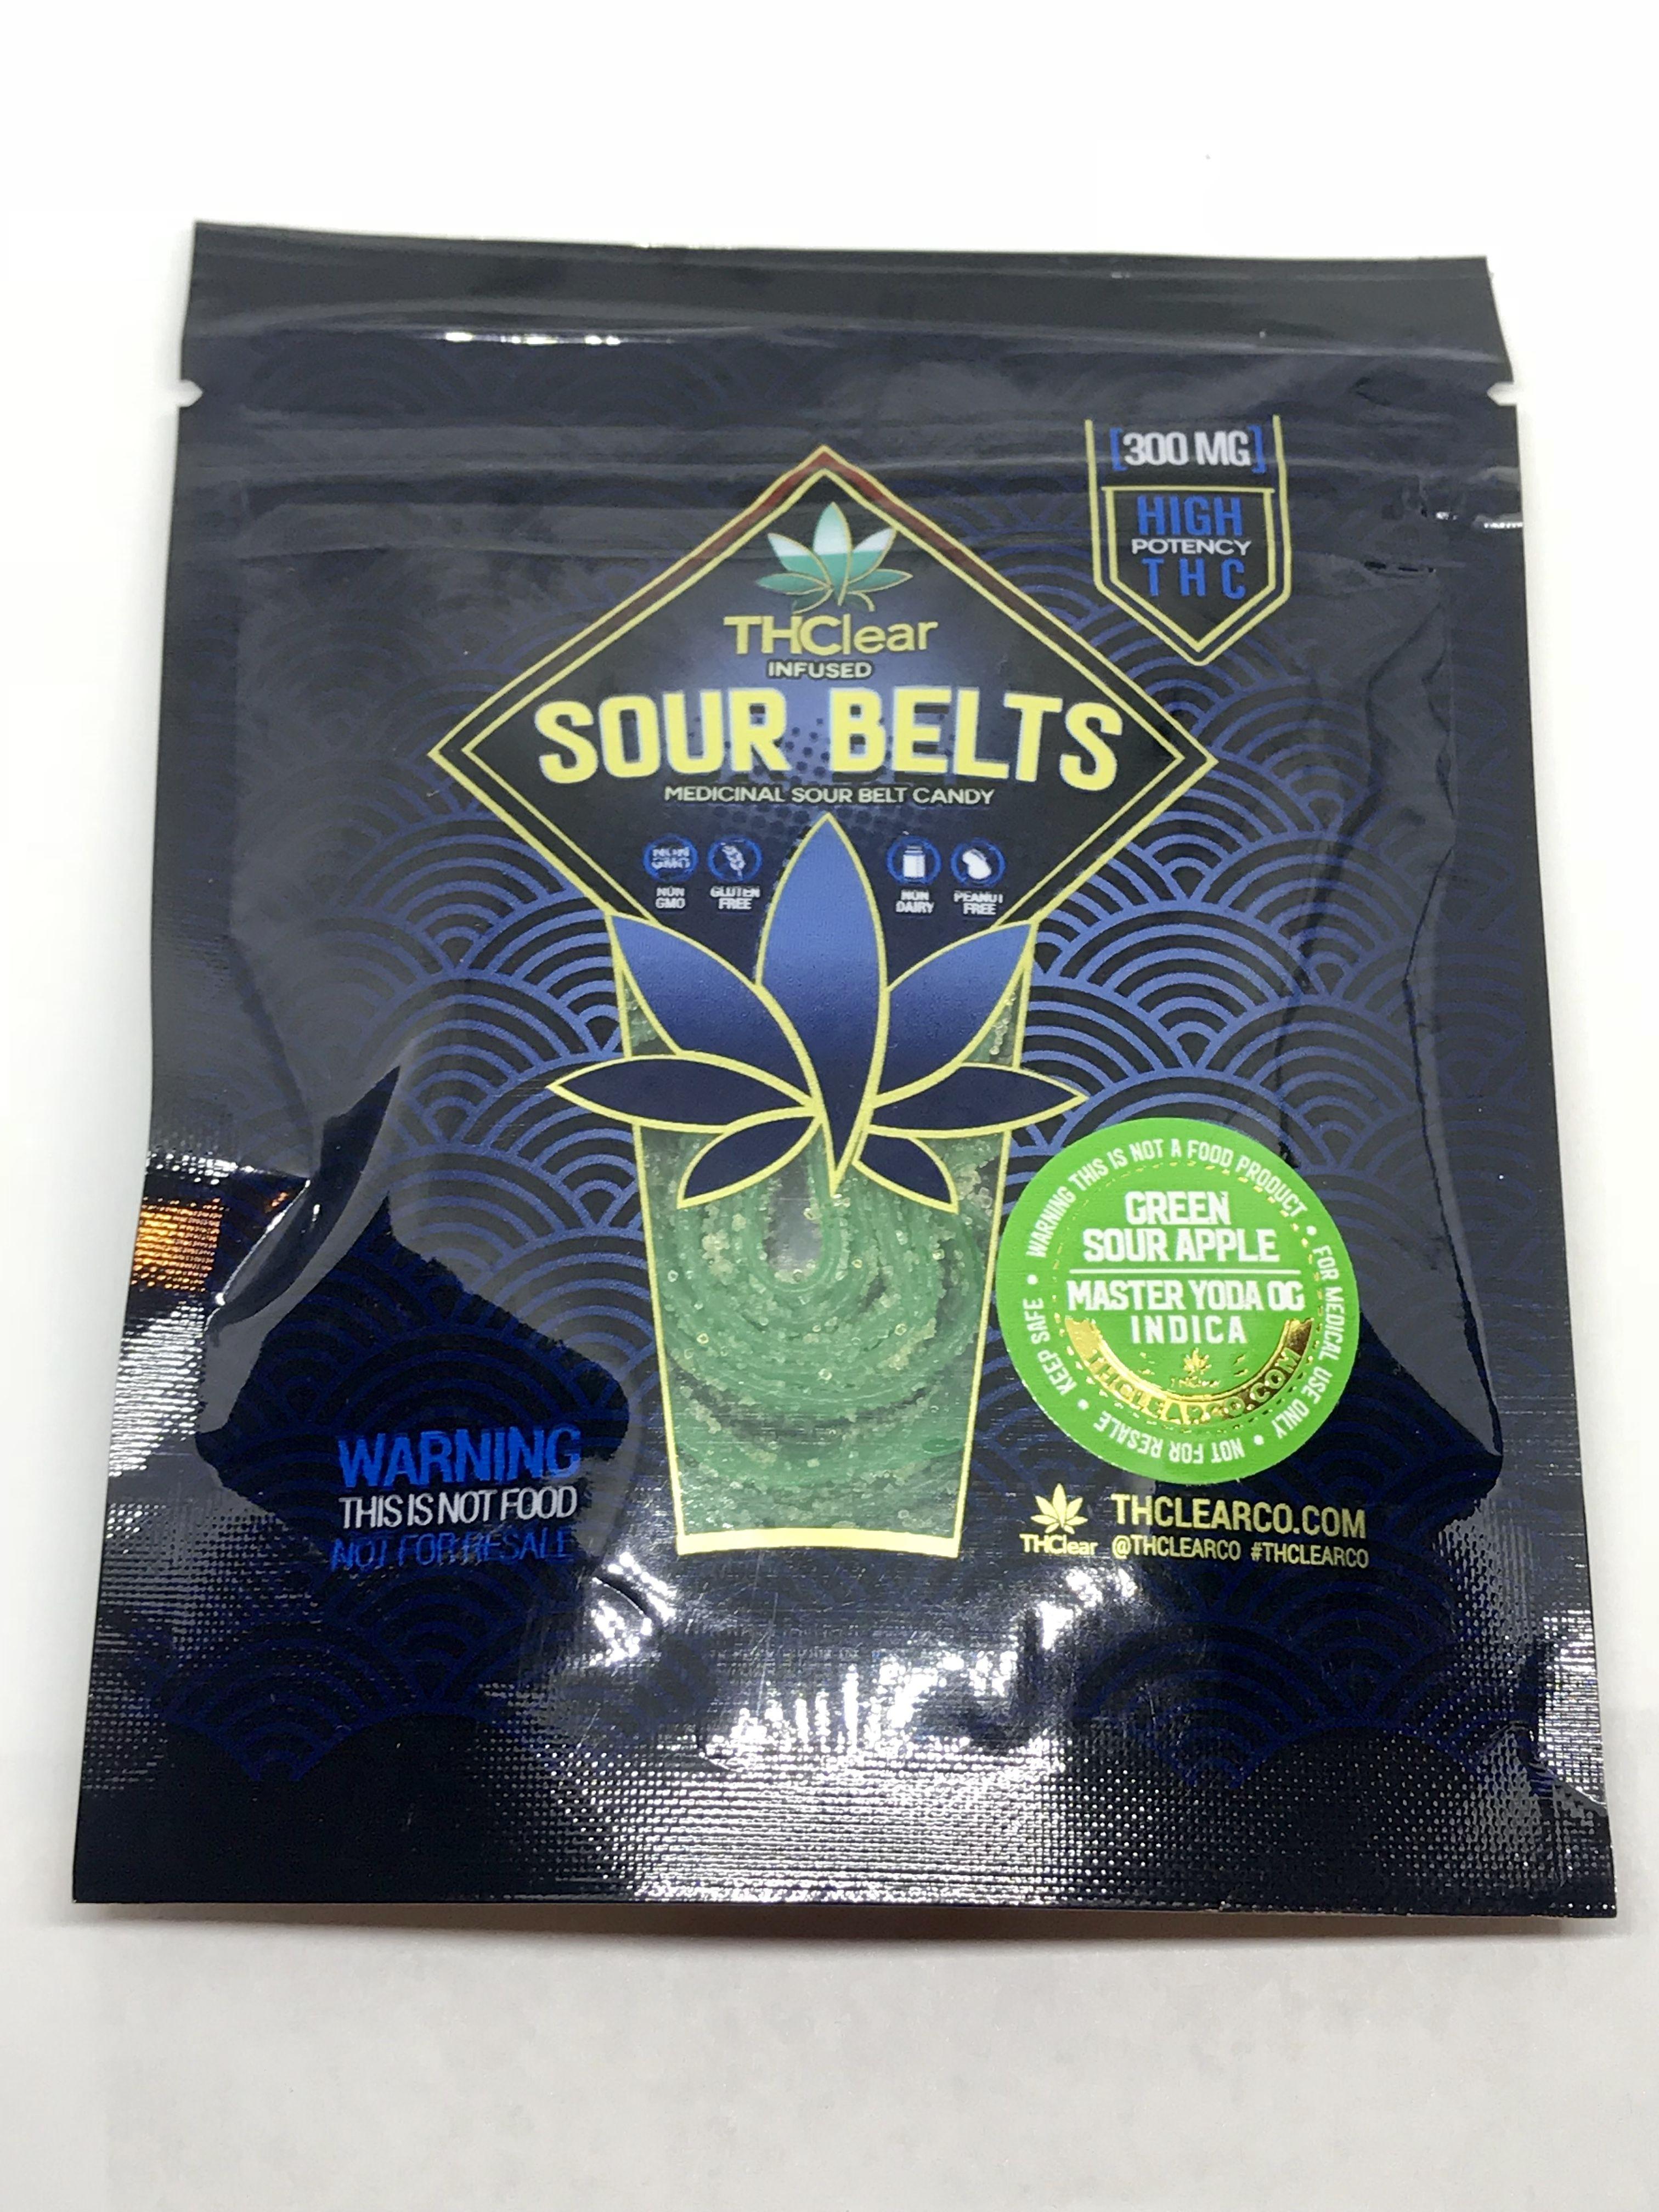 THClear Green Sour Apple Belts